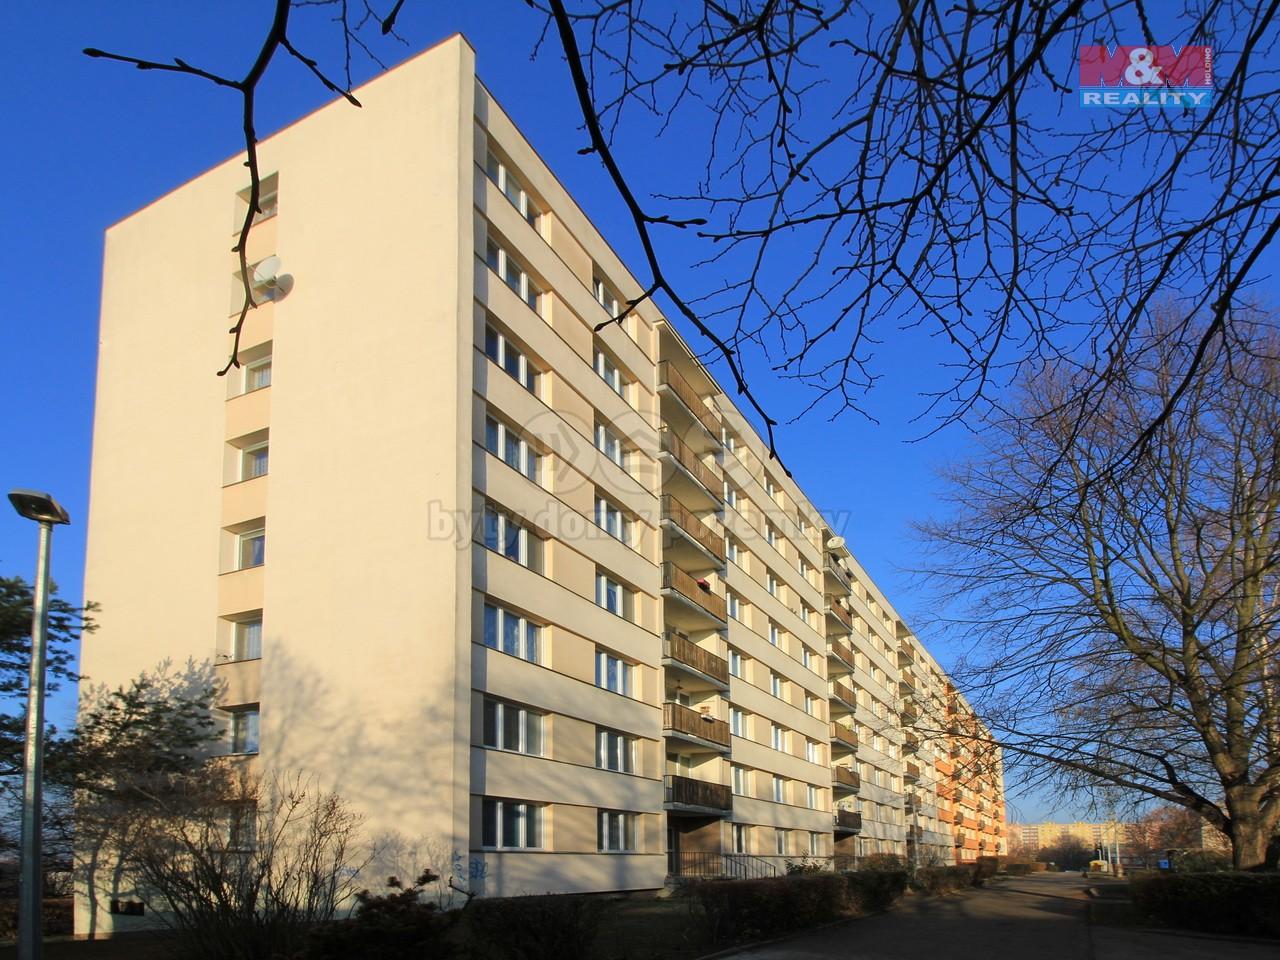 Prodej, byt 3+1, 65 m2, OV, Ústí nad Labem, ul. Svojsíkova